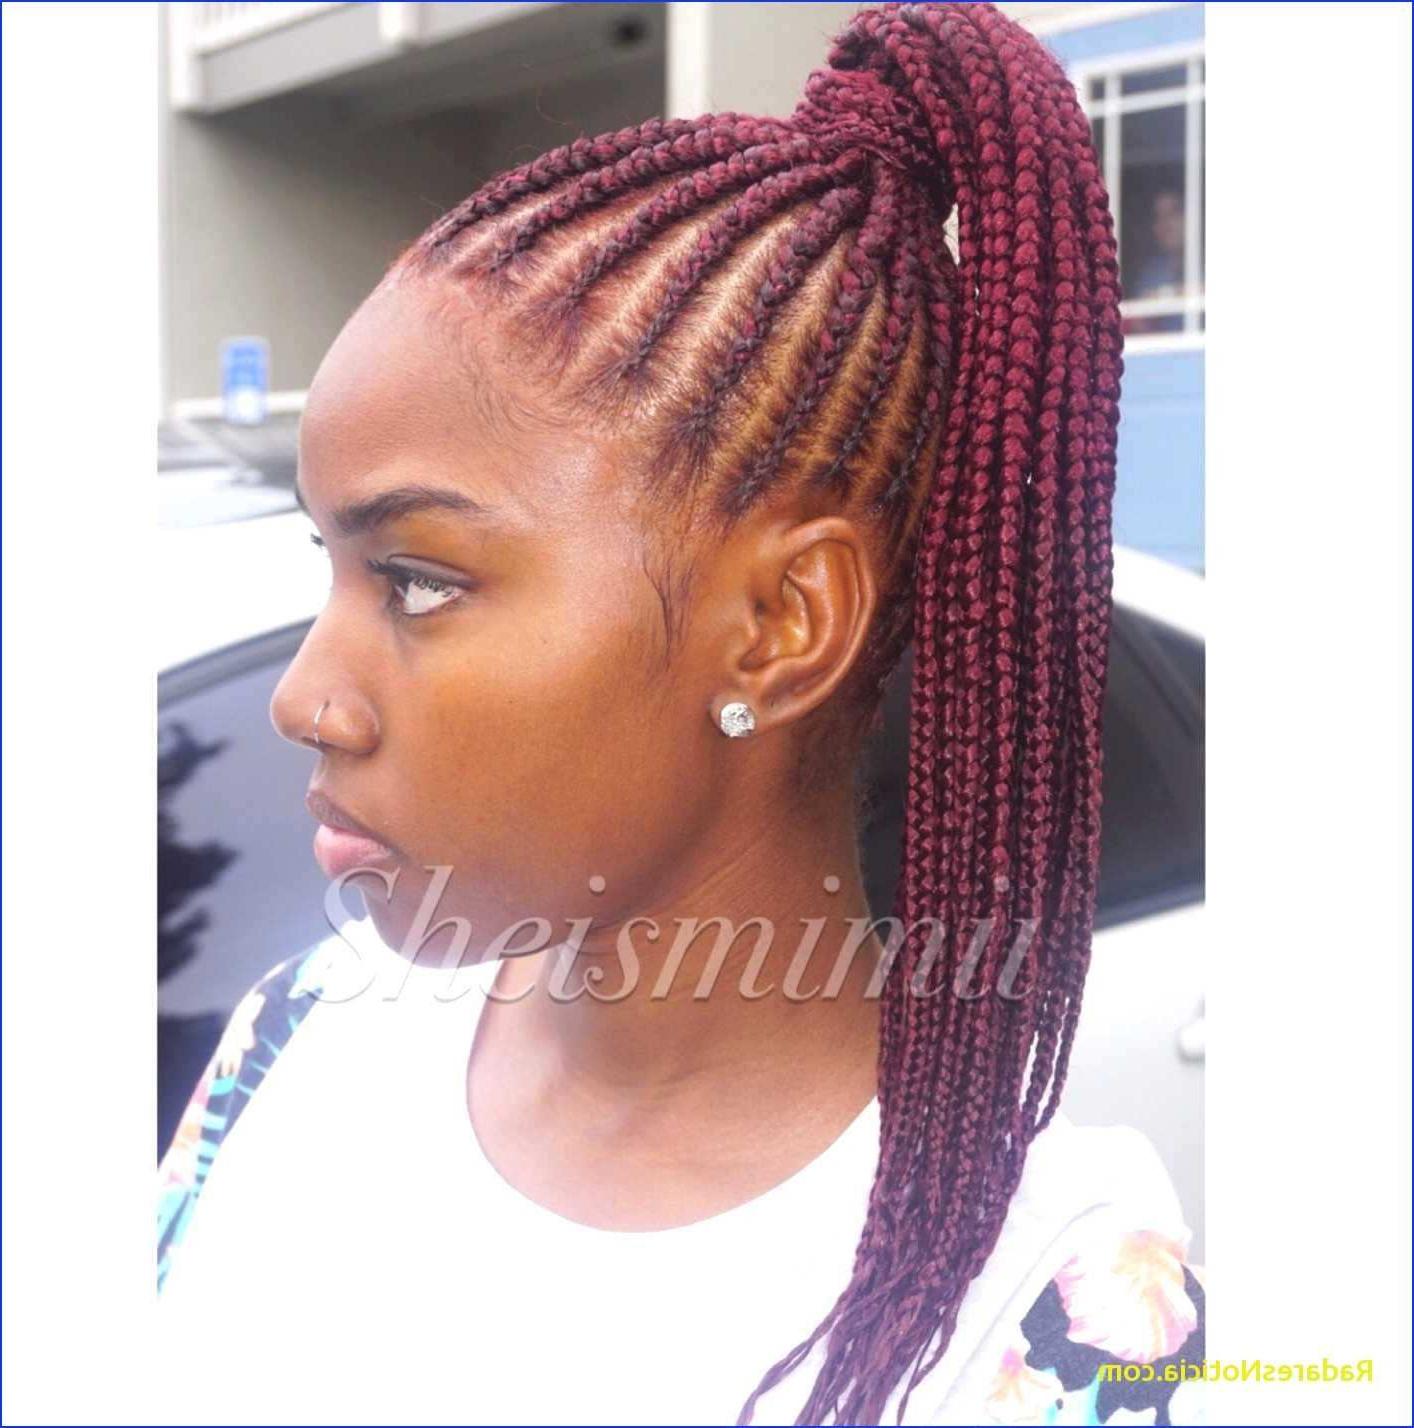 Fashion : 20 Great Ponytail Braid Hairstyles Picture 68 Within Trendy Ponytail Braid Hairstyles (View 6 of 20)